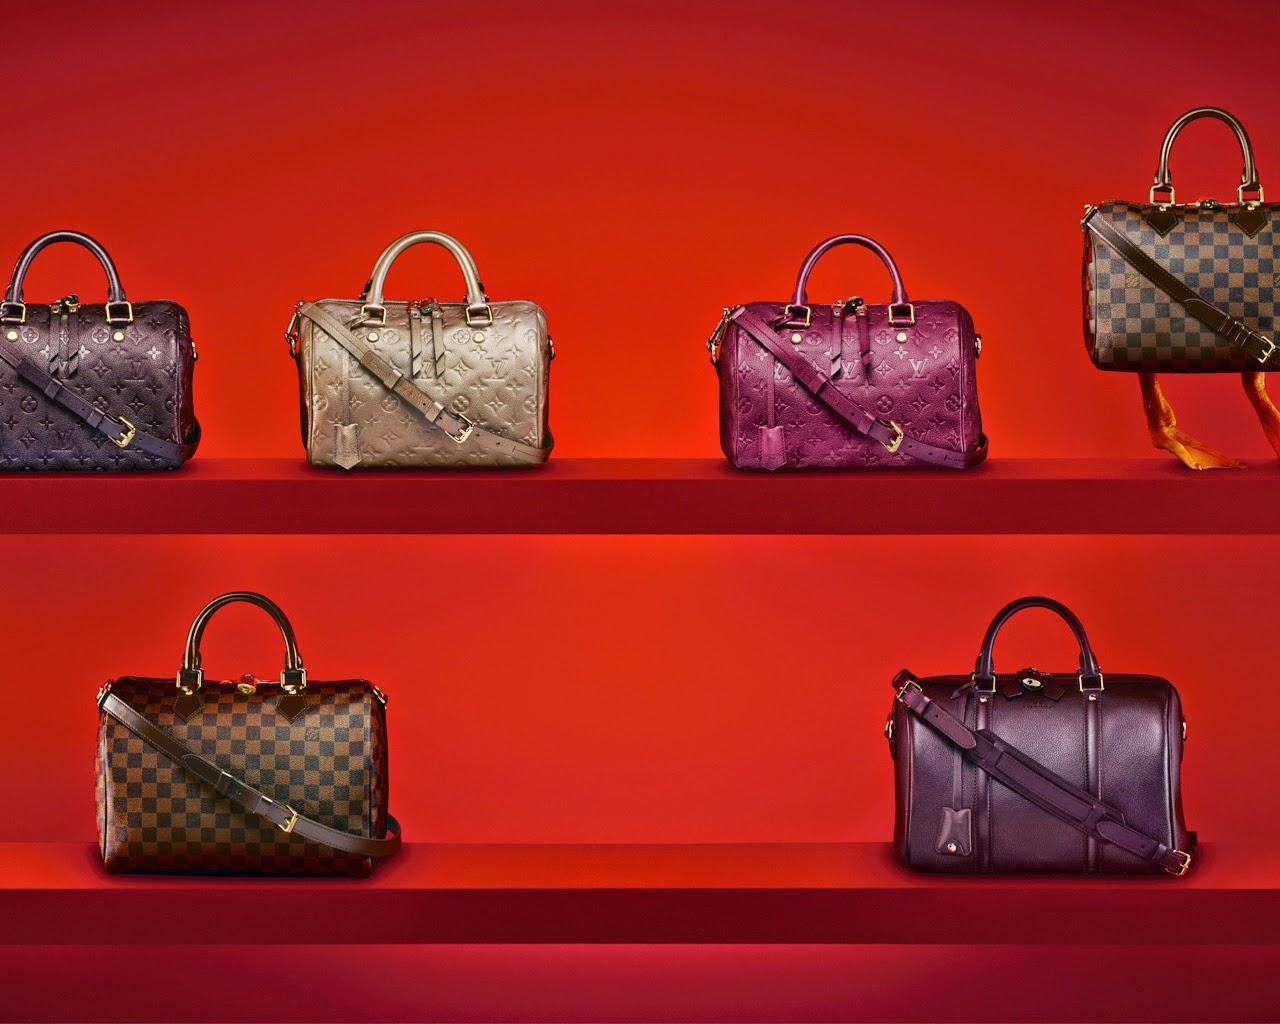 Cowo Louis Vuitton Festive Holiday Season Handbags Oth Jpg